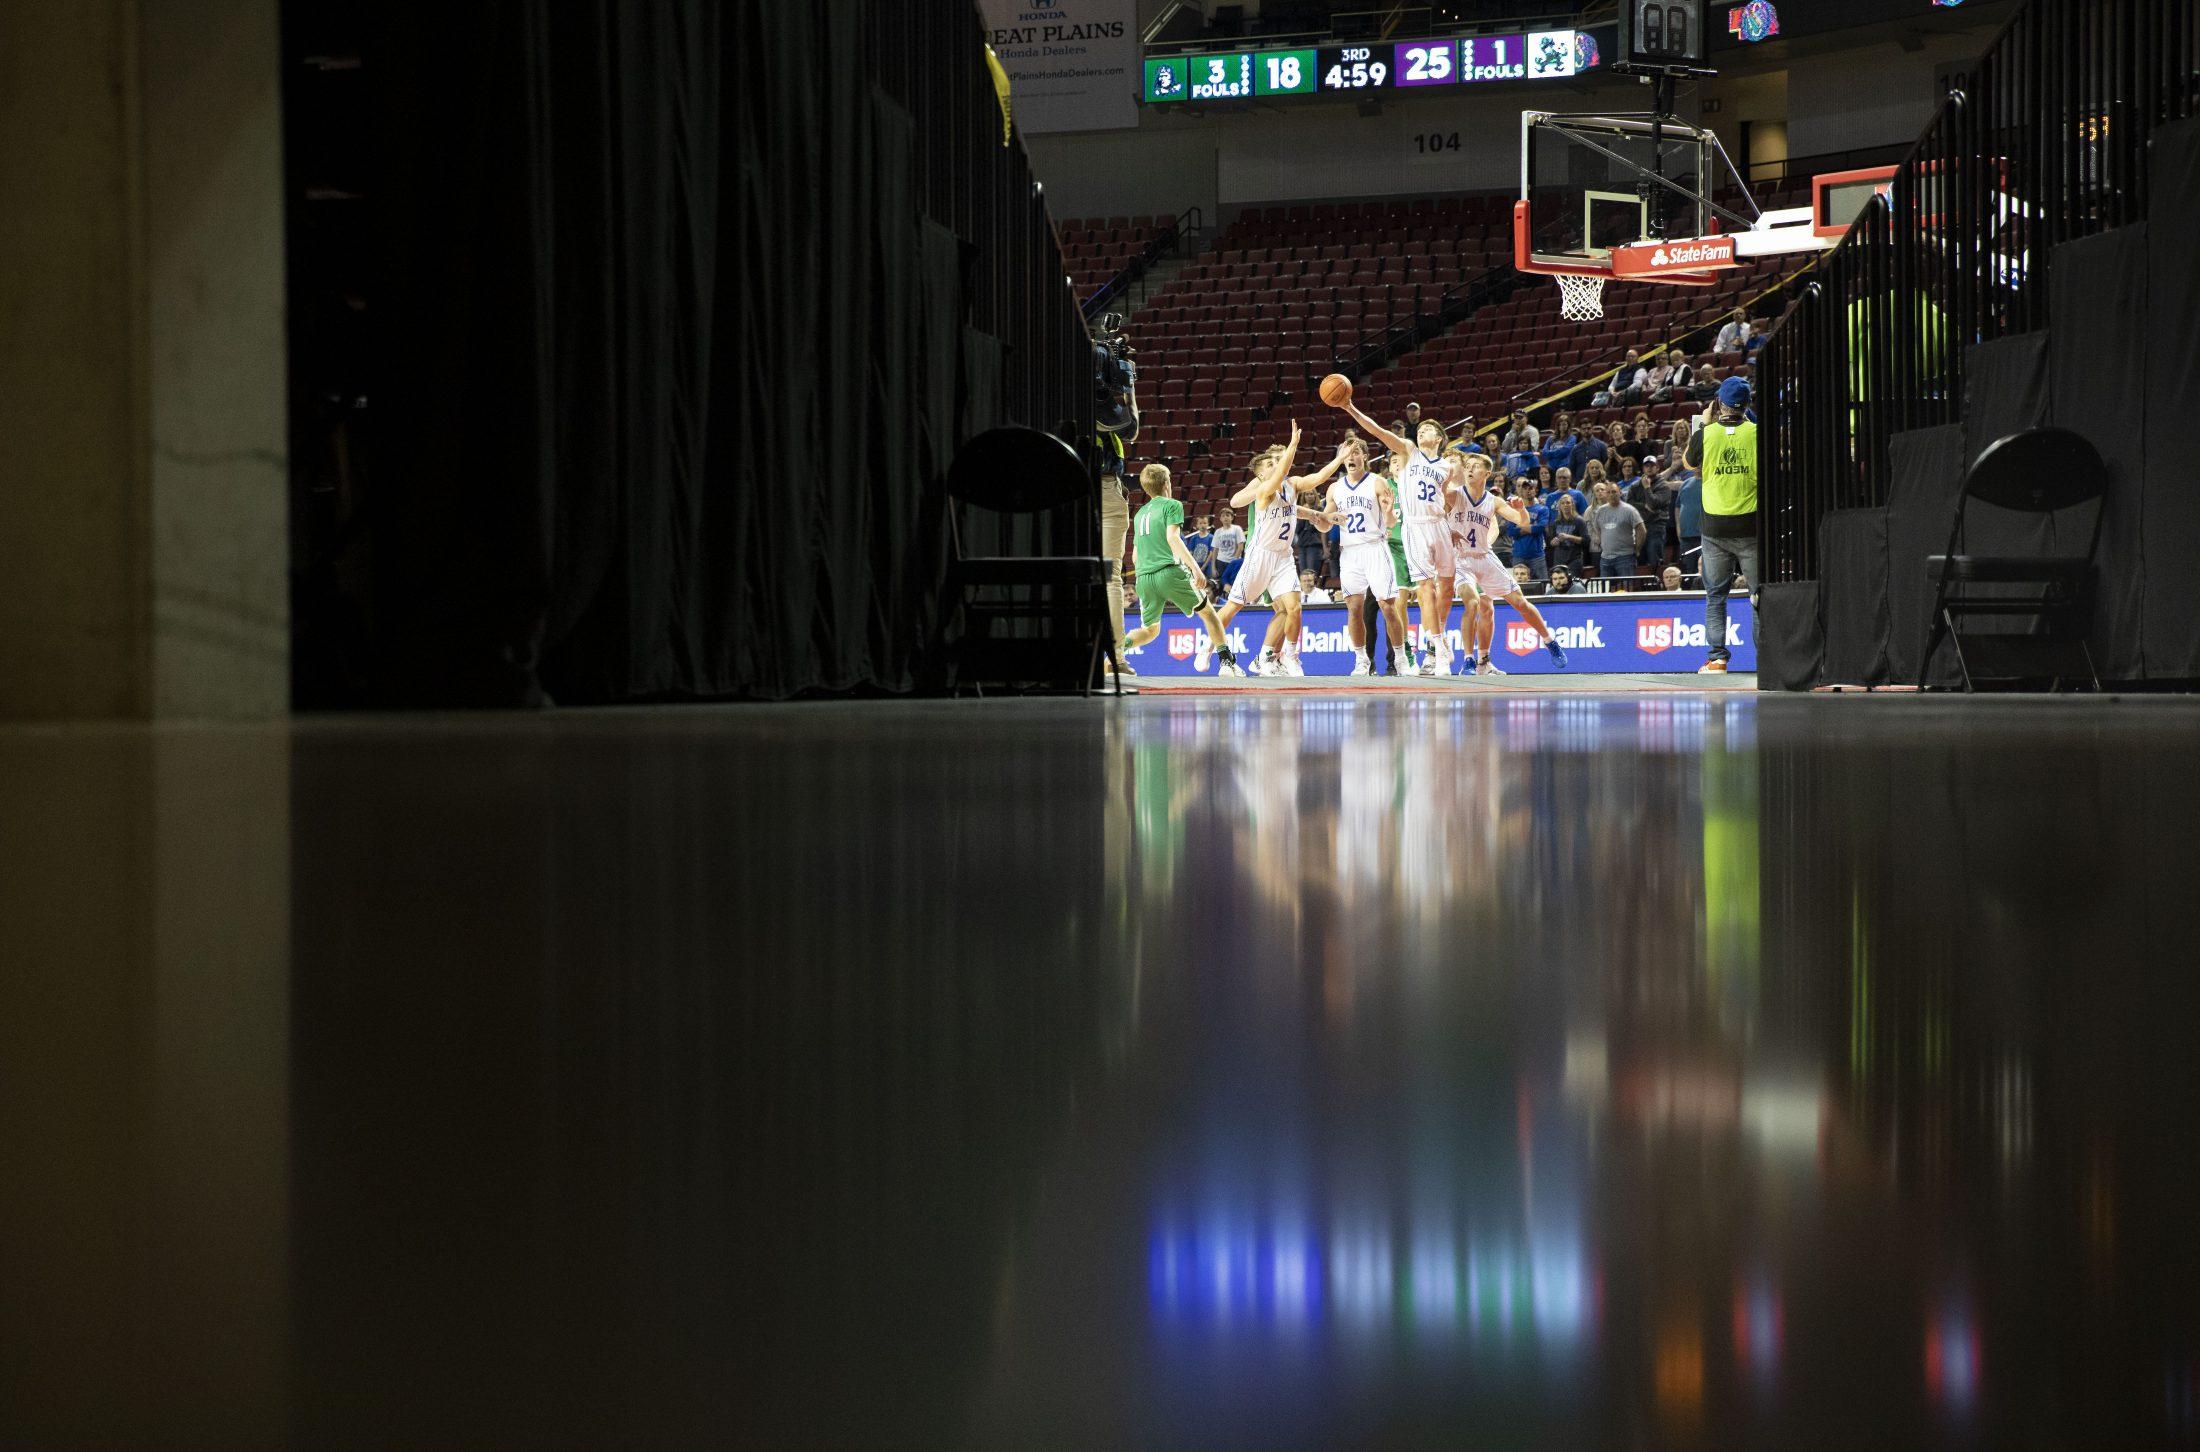 20200315 spo statesat kf24 e1588799511617 - Nebraska state basketball continues despite COVID-19 concerns